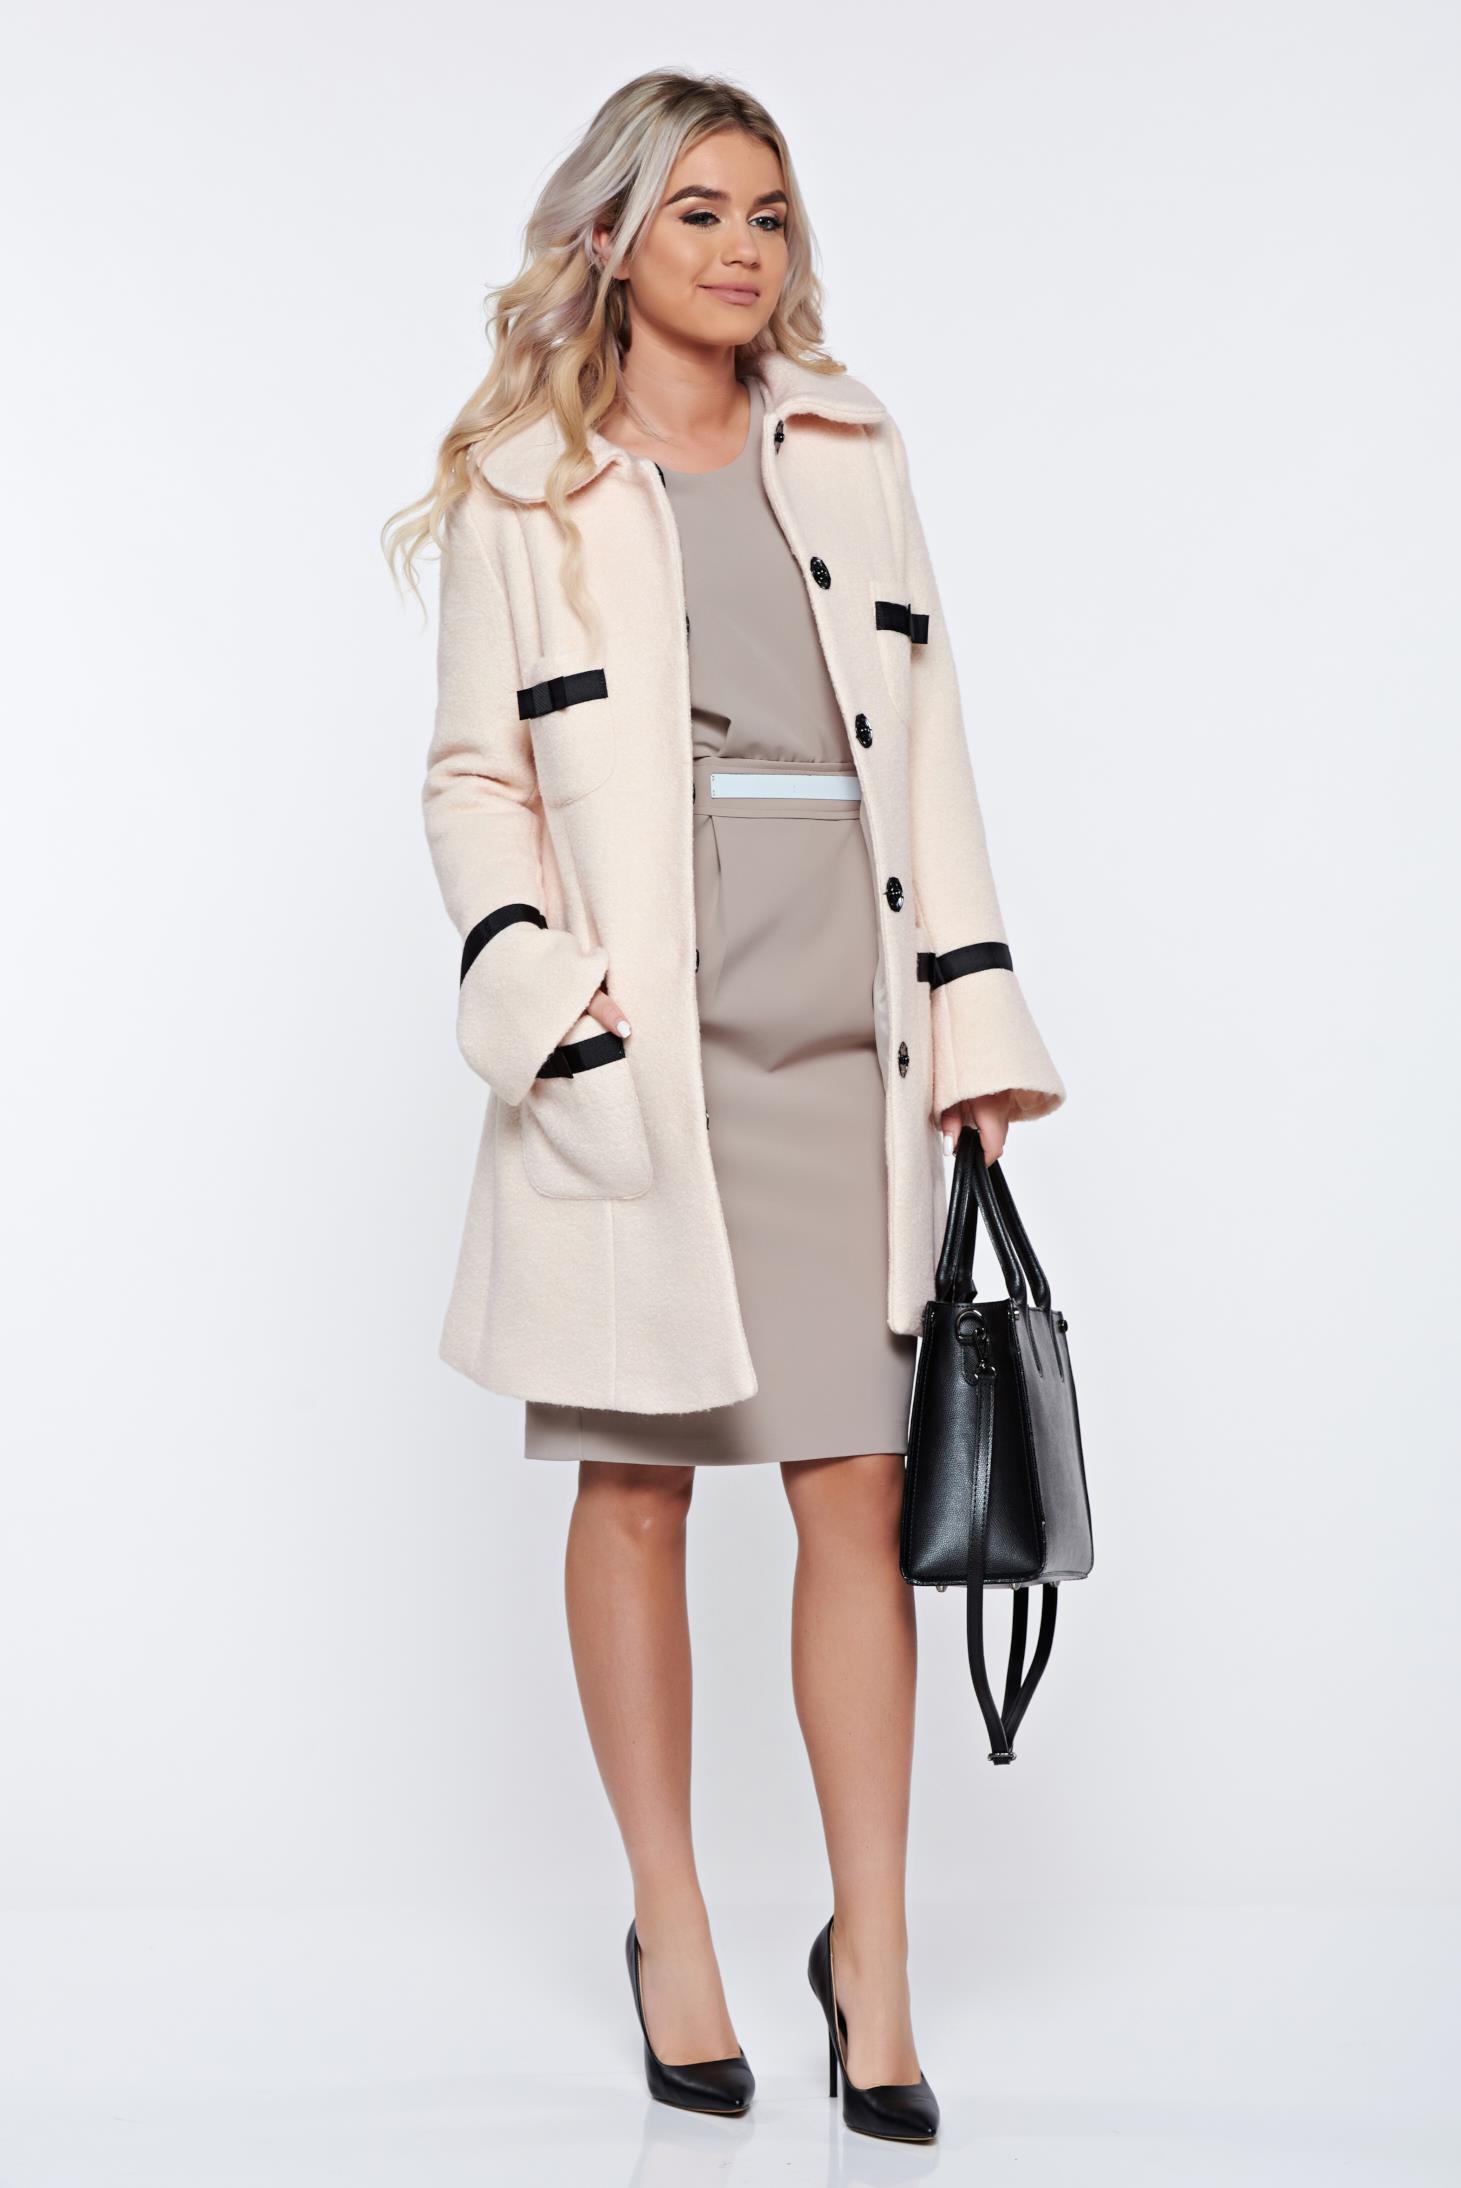 Palton LaDonna crem elegant din lana drept cu guler rotunjit accesorizat cu fundite